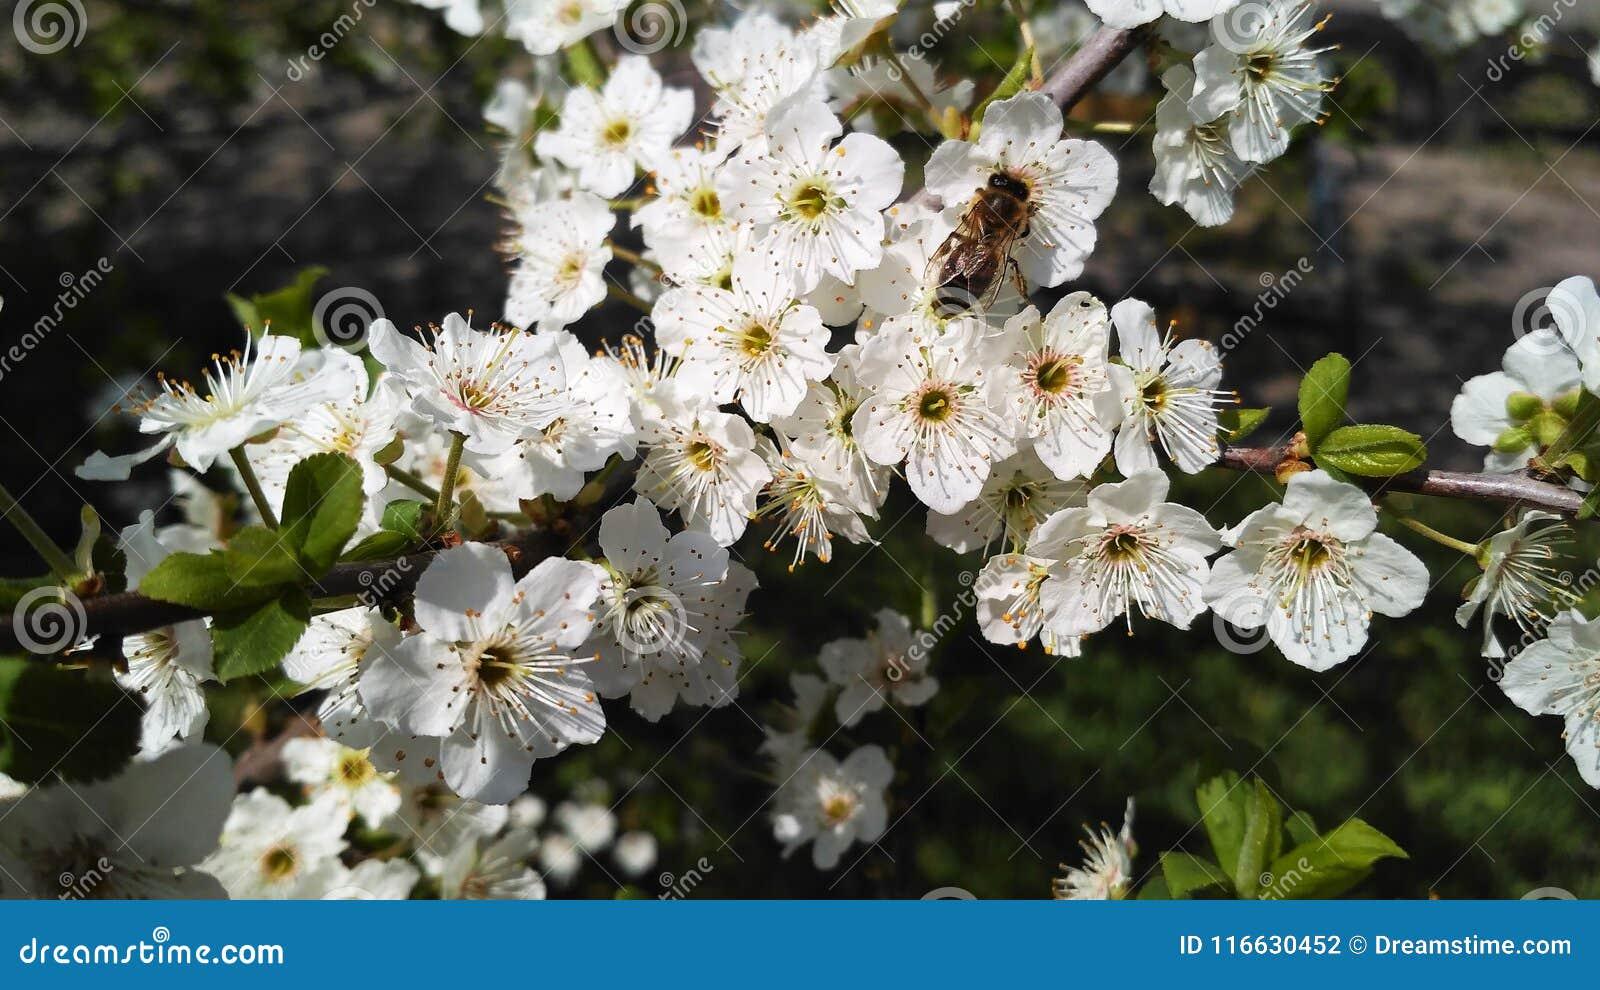 Paradise Of Flowers Stock Photo Image Of Garden Super 116630452